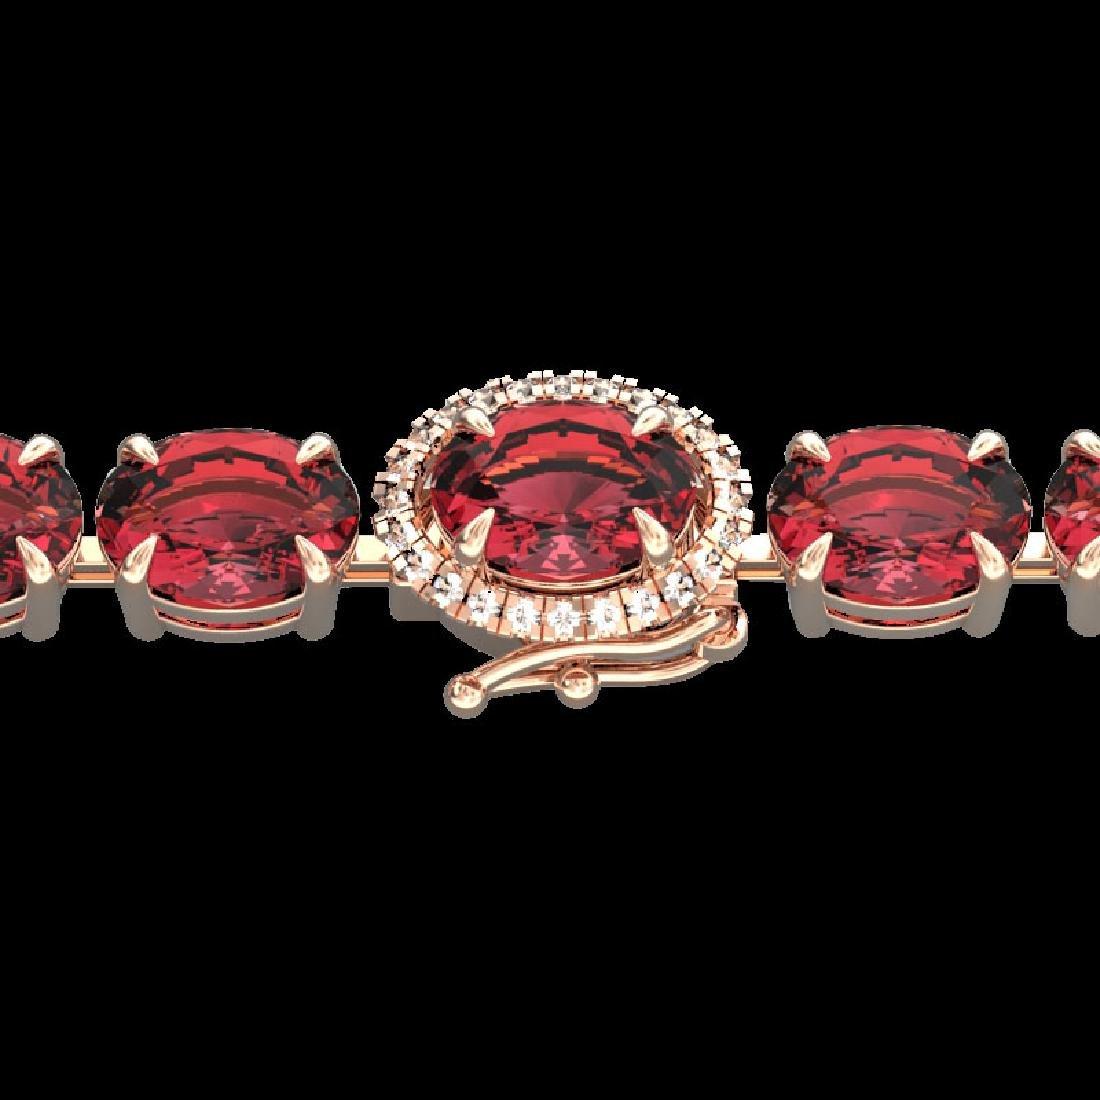 17.25 CTW Pink Tourmaline & VS/SI Diamond Micro Halo